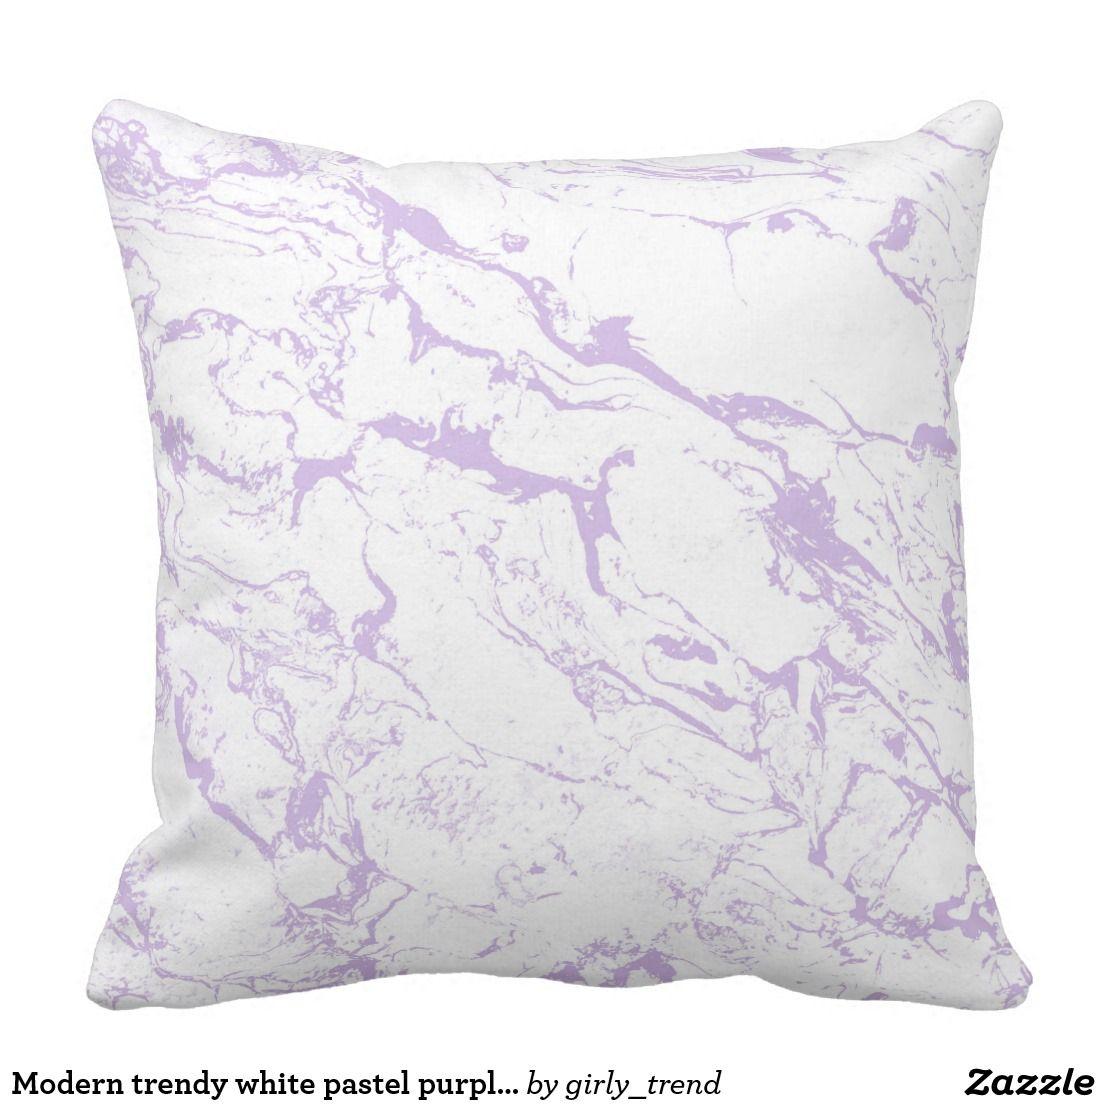 Modern Trendy White Pastel Purple Lavender Marble Throw Pillow